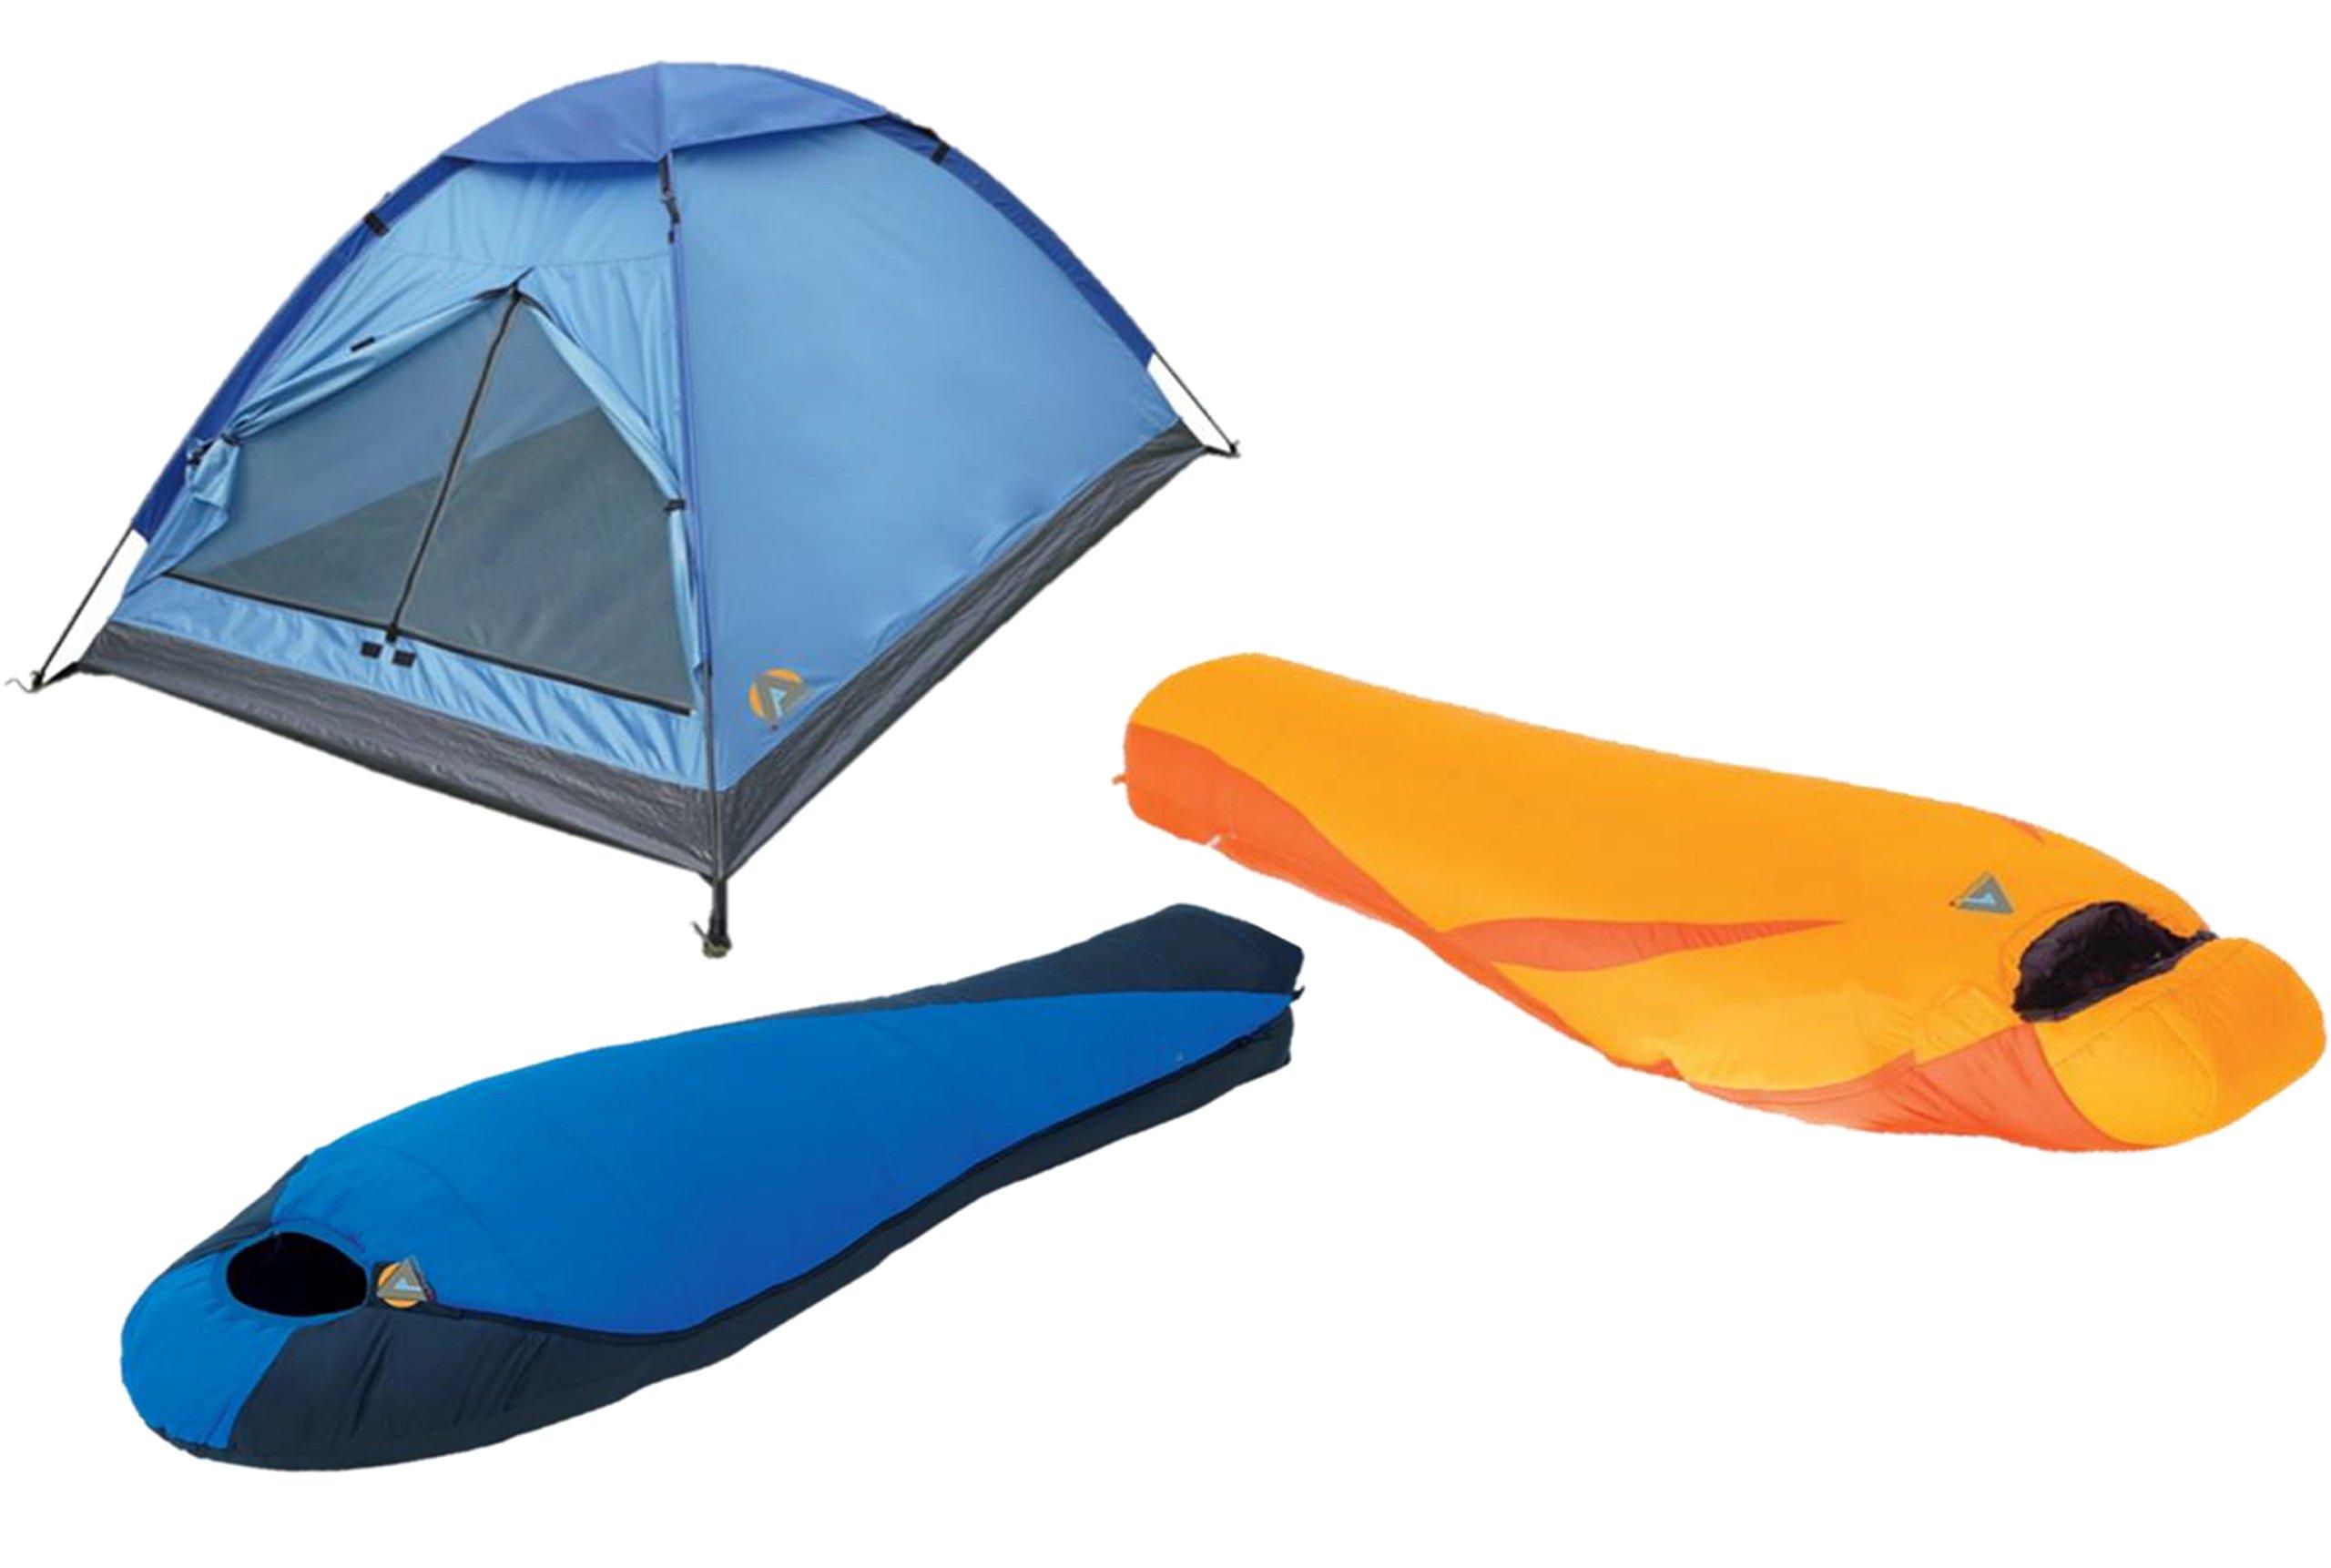 High Peak USA Alpinizmo Extreme Pak 0F & Latitude 20F Sleeping 3 Men Tent Combo Set, Blue/Orange, One Size by Alpinizmo